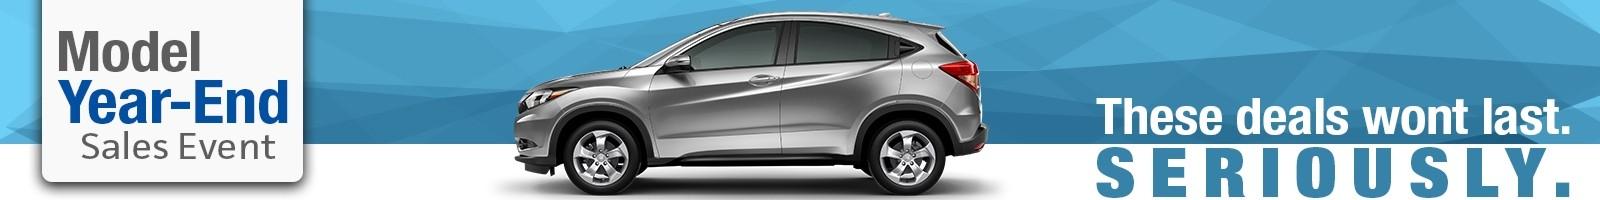 Bianchi Honda Model Year End Sales Event